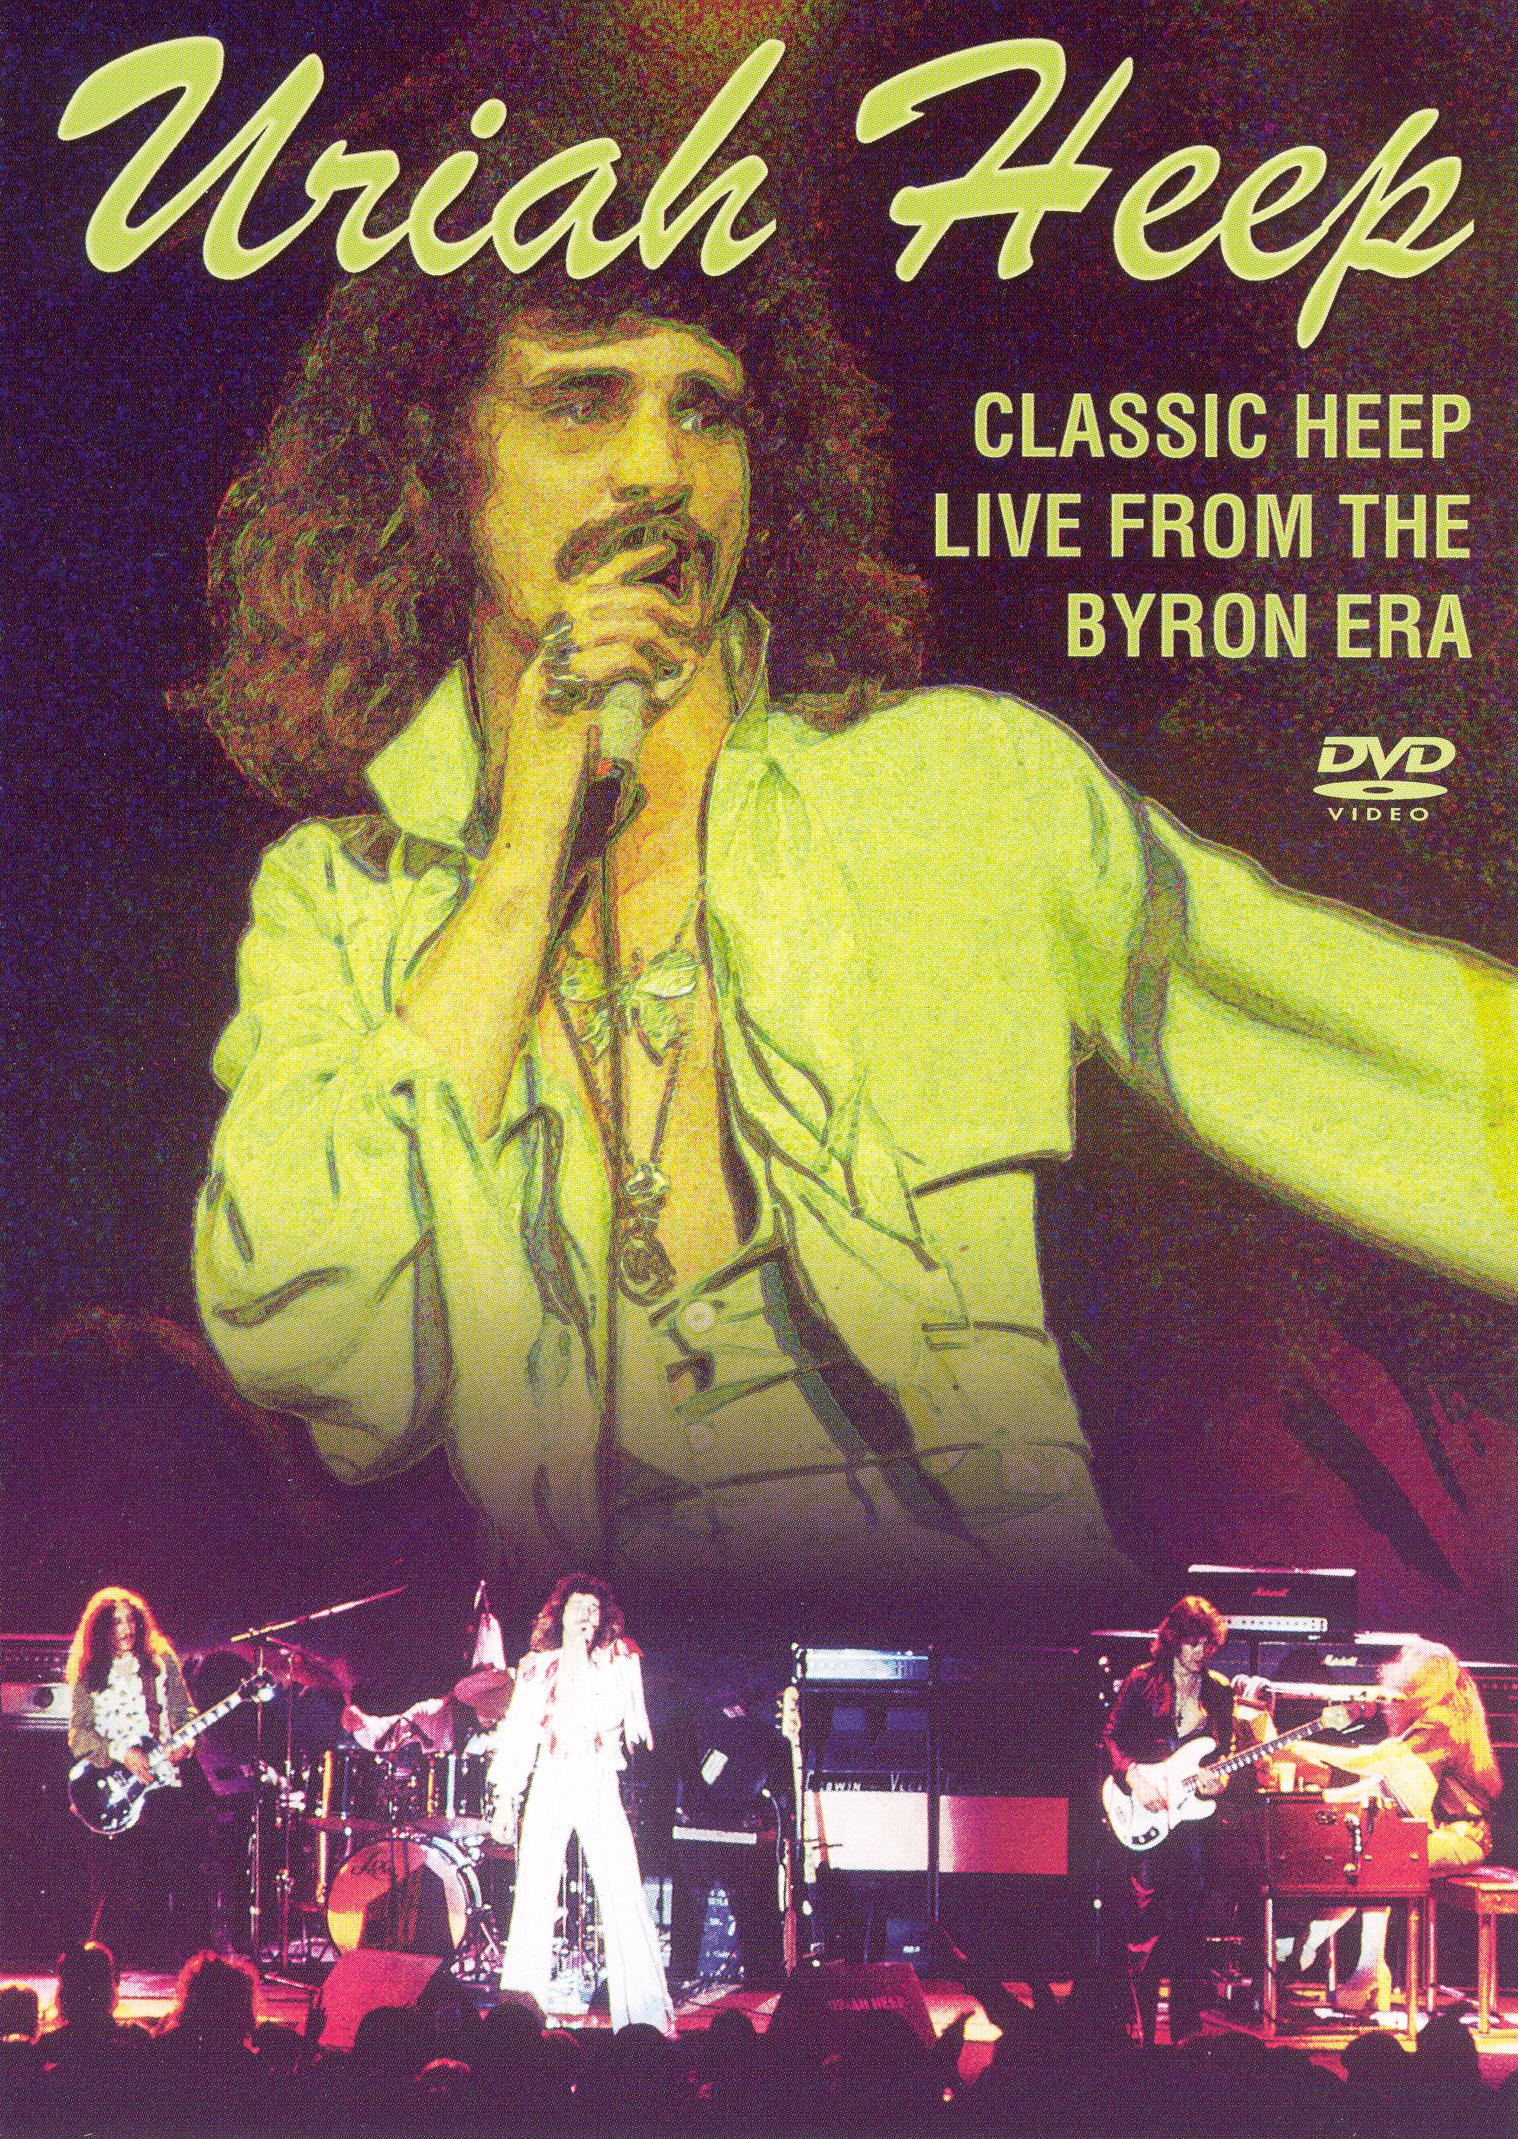 Uriah Heep: Classic Heep - Live From the David Byron Era